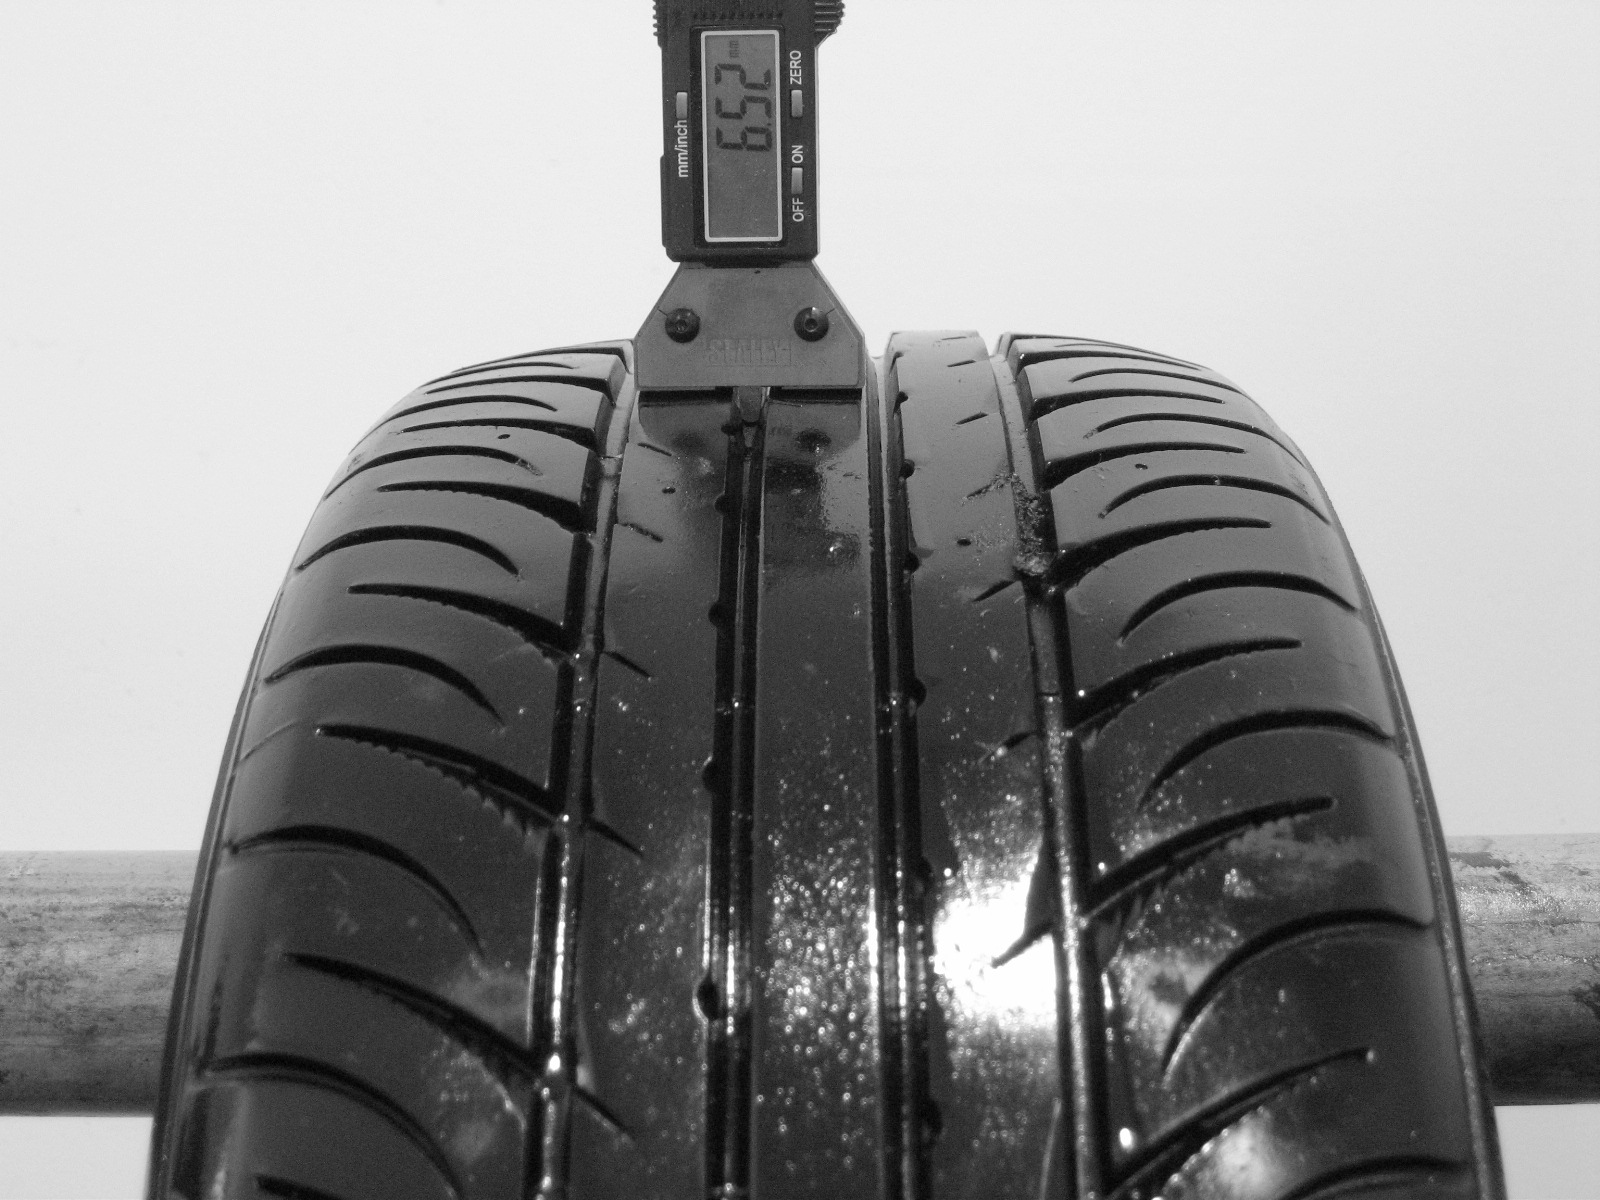 Použité-Pneu-Bazar - 205/55 R16 KUMHO ECSTA SPT 91V-kusovka-rezerva 3mm